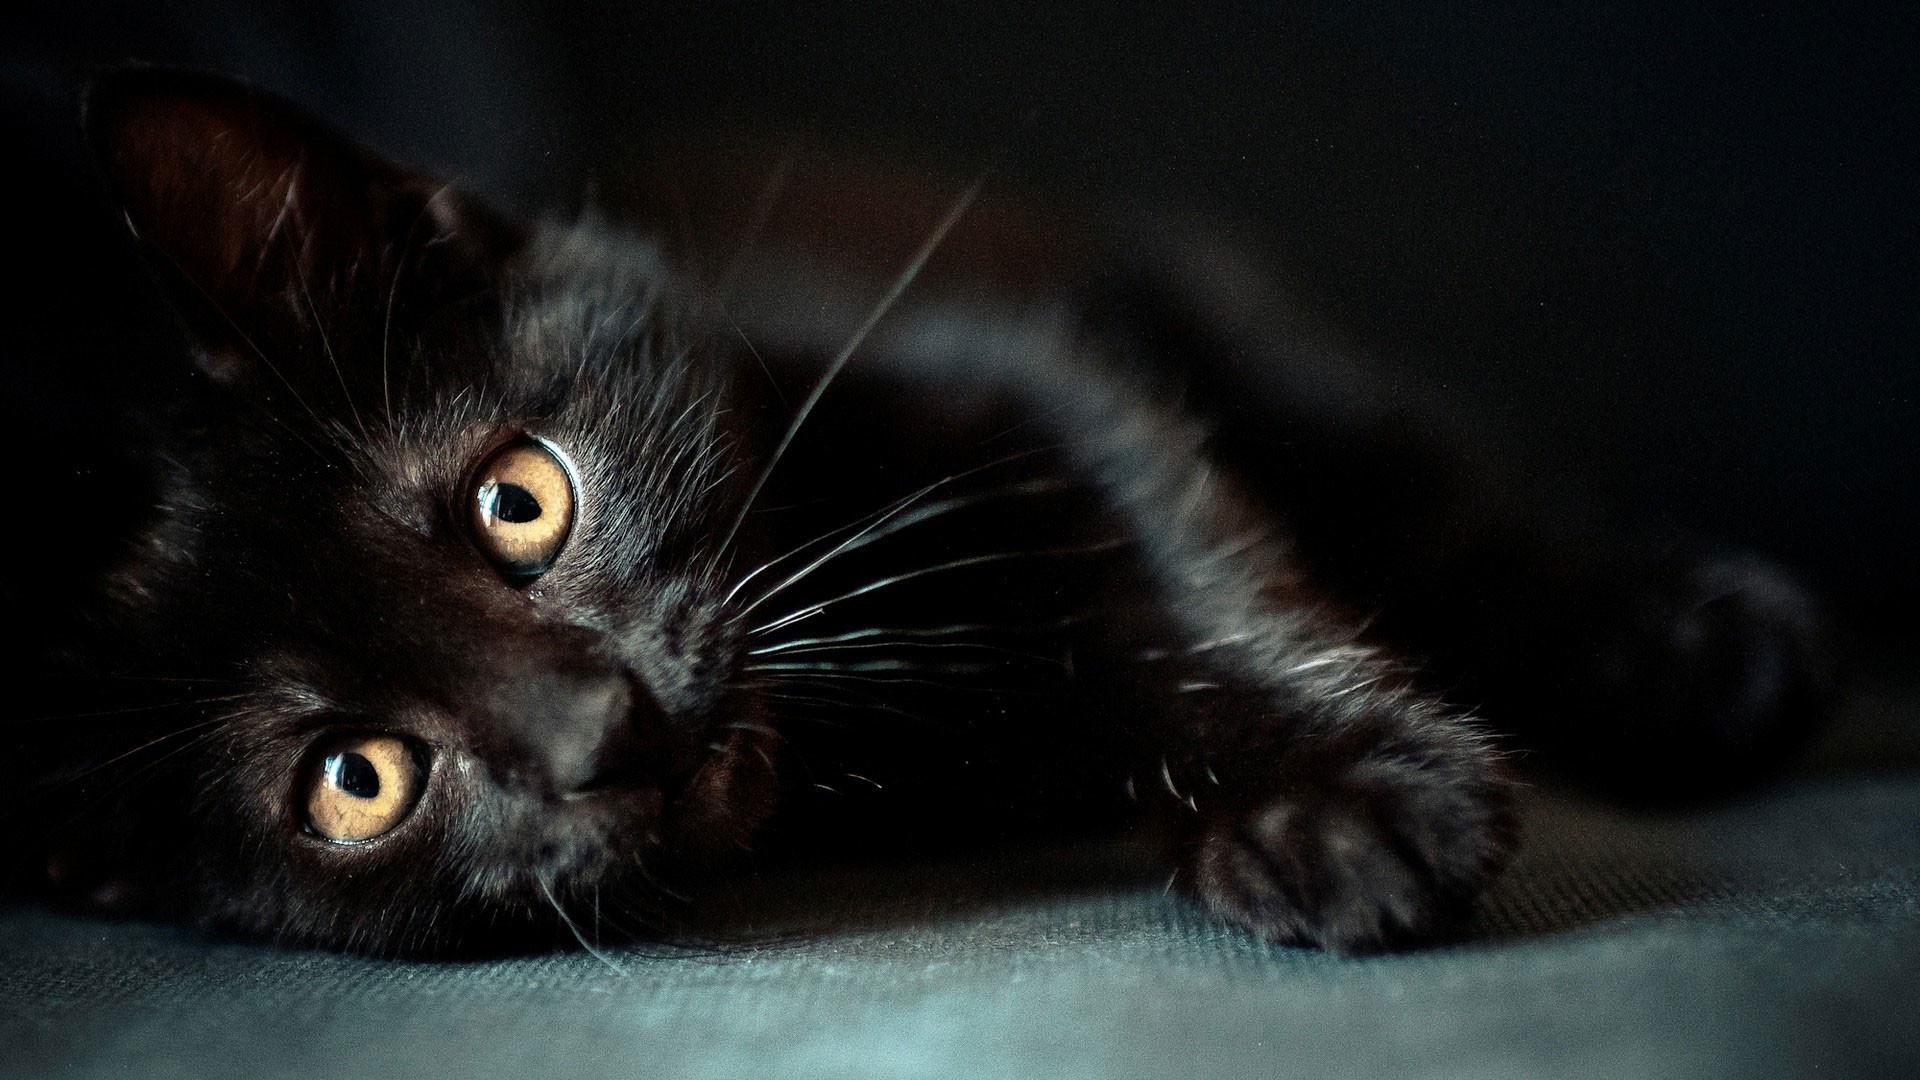 hd pics photos cute pure full black cat attractive stunning hd quality desktop  background wallpaper